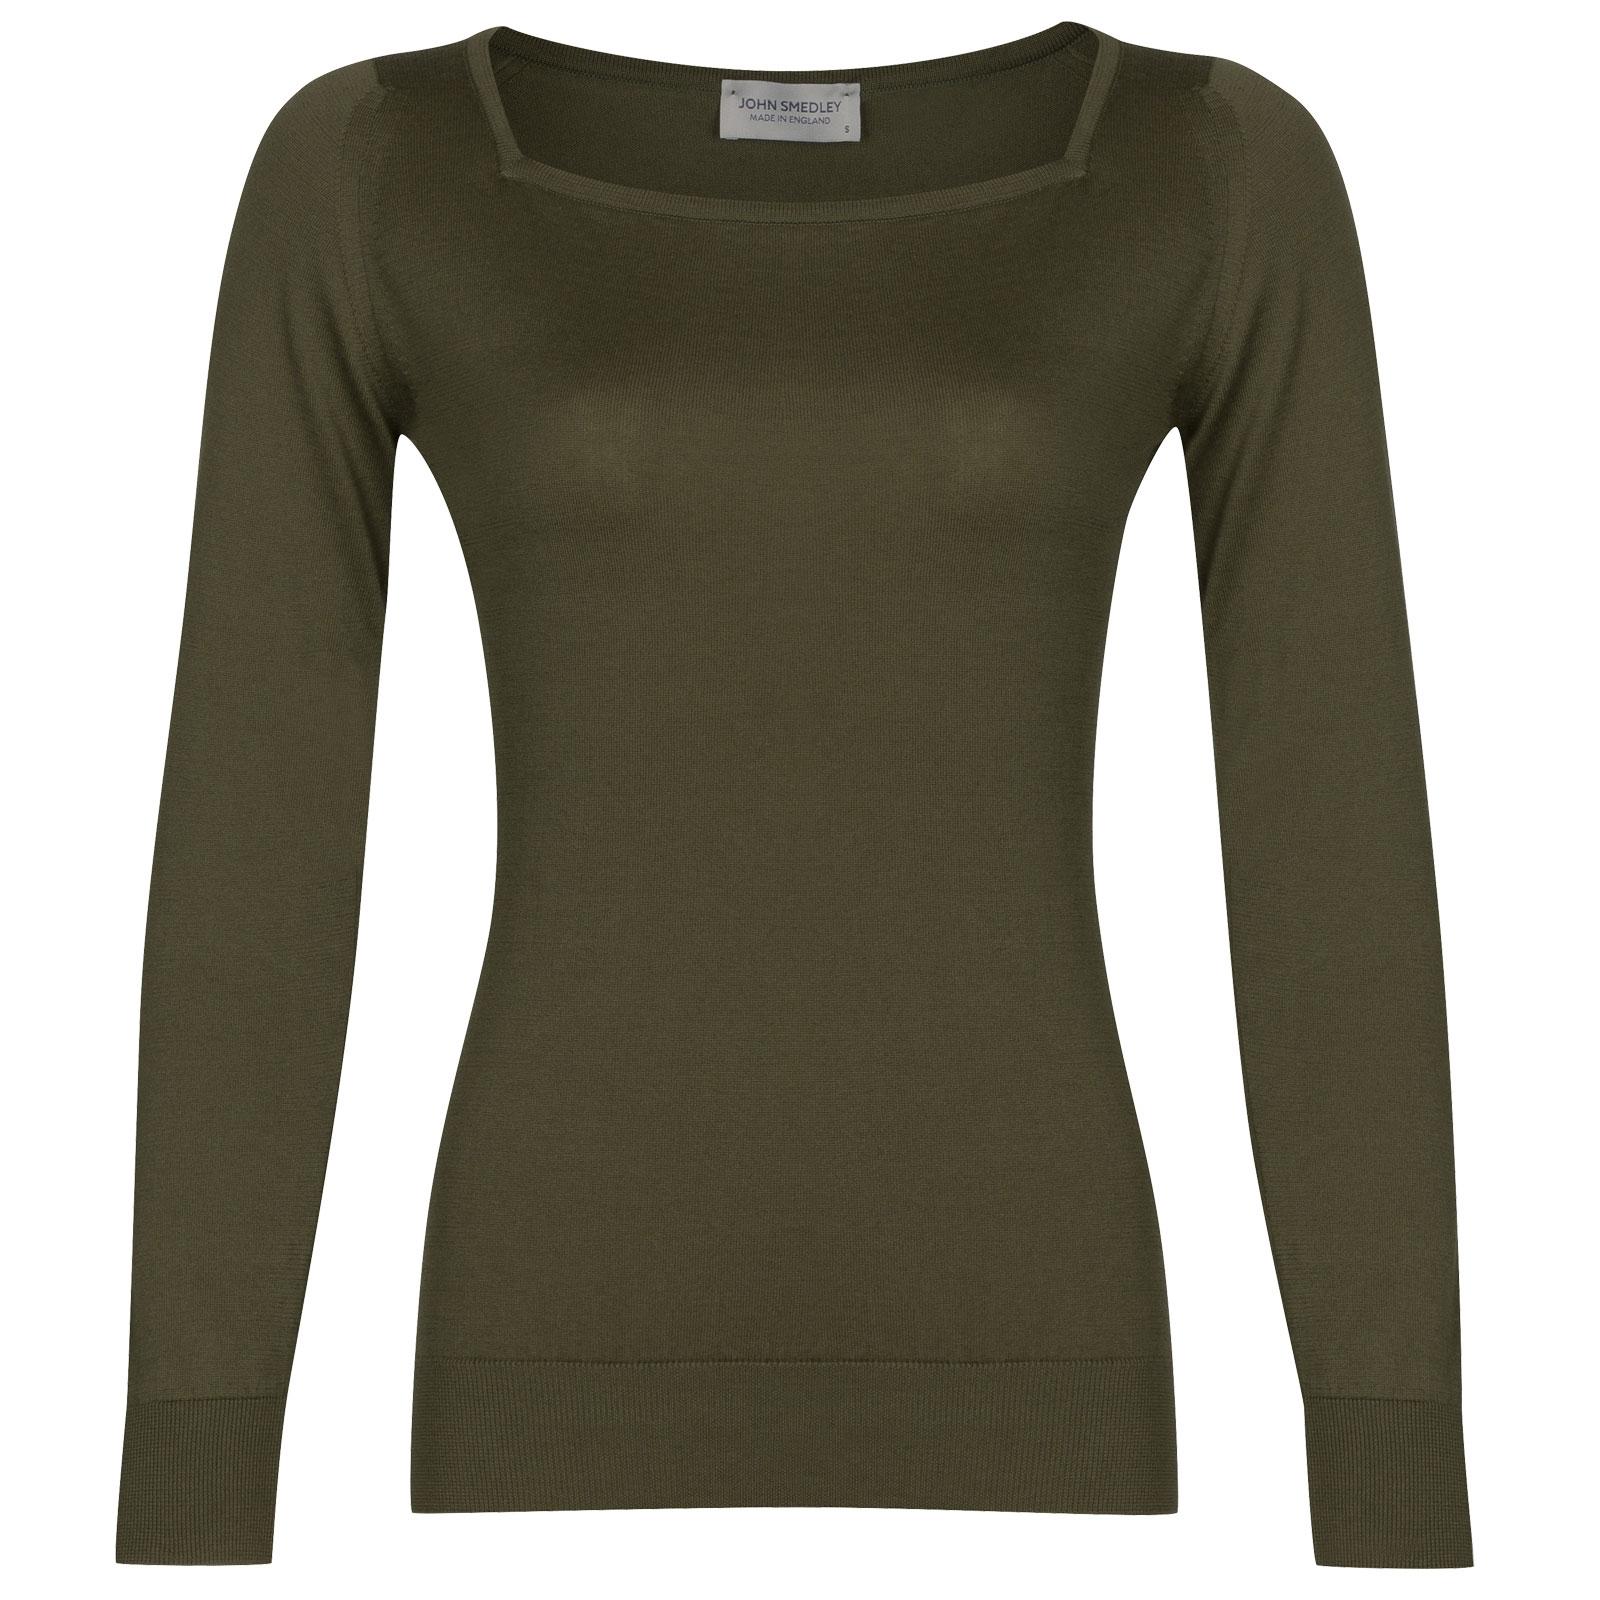 John Smedley Katia in Sepal Green Sweater-LGE